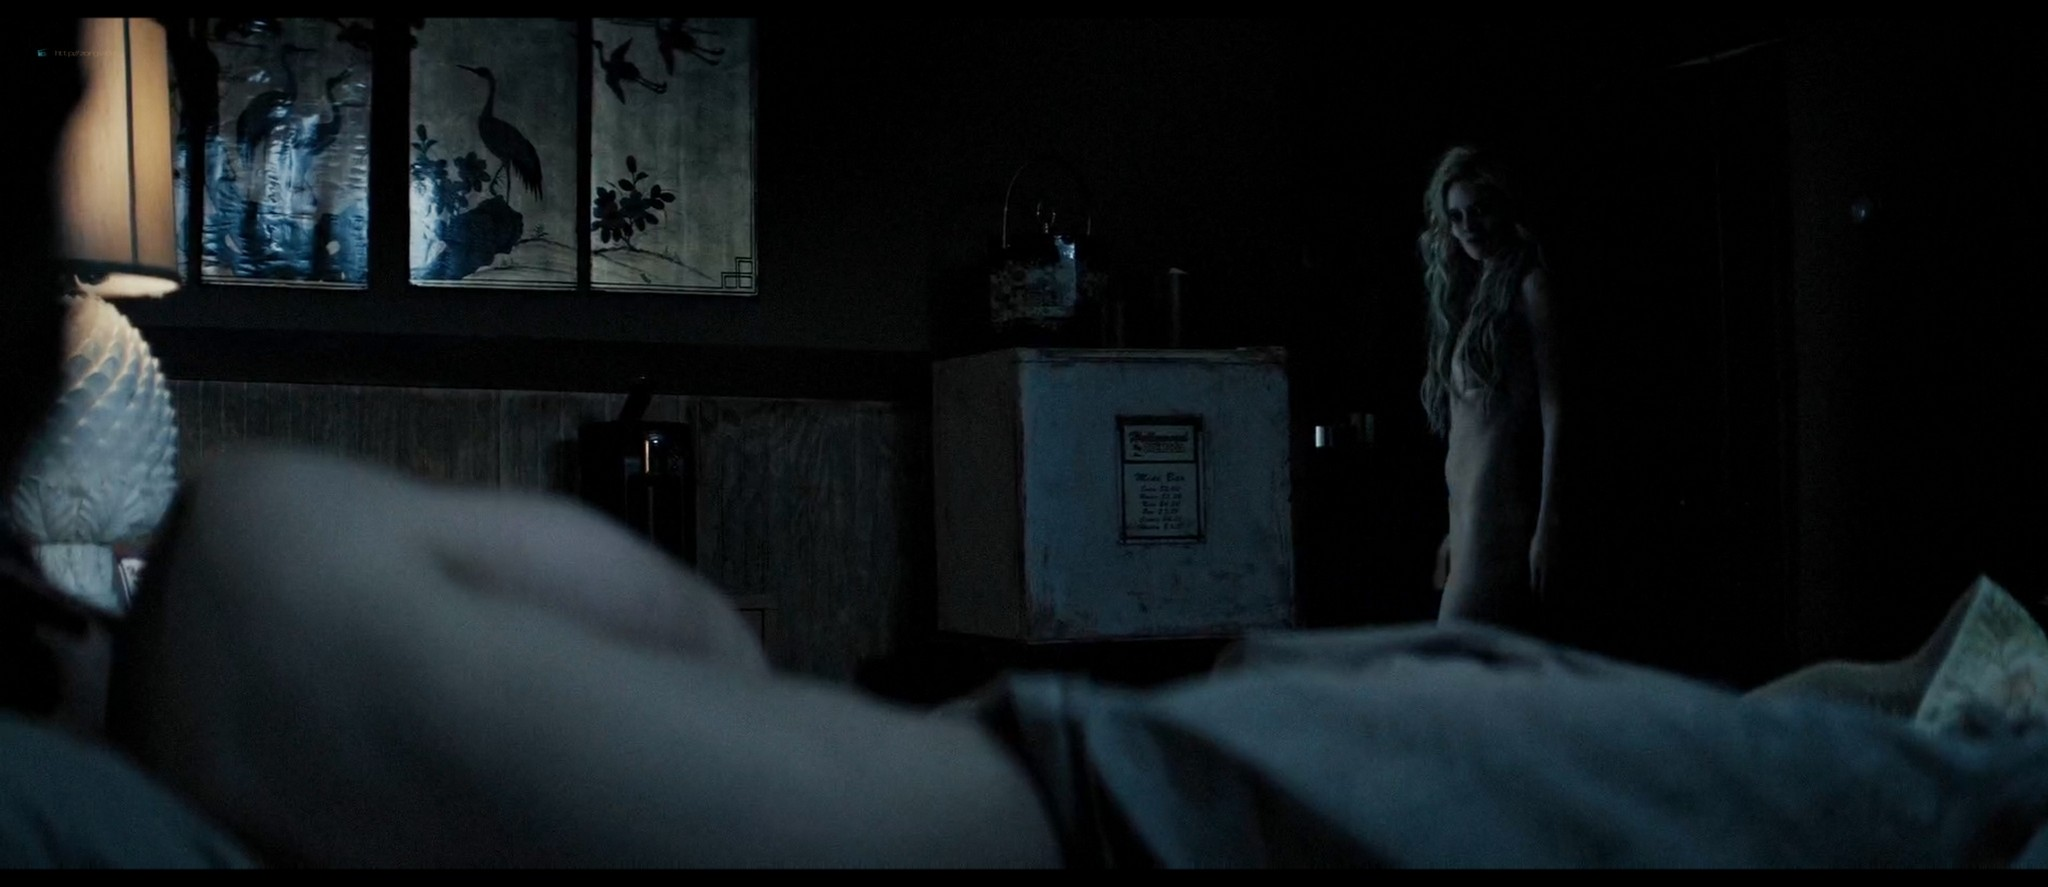 Samara Weaving nude butt and boobs Carly Chaikin sexy - Last Moment of Clarity (2020) HD 1080p (3)